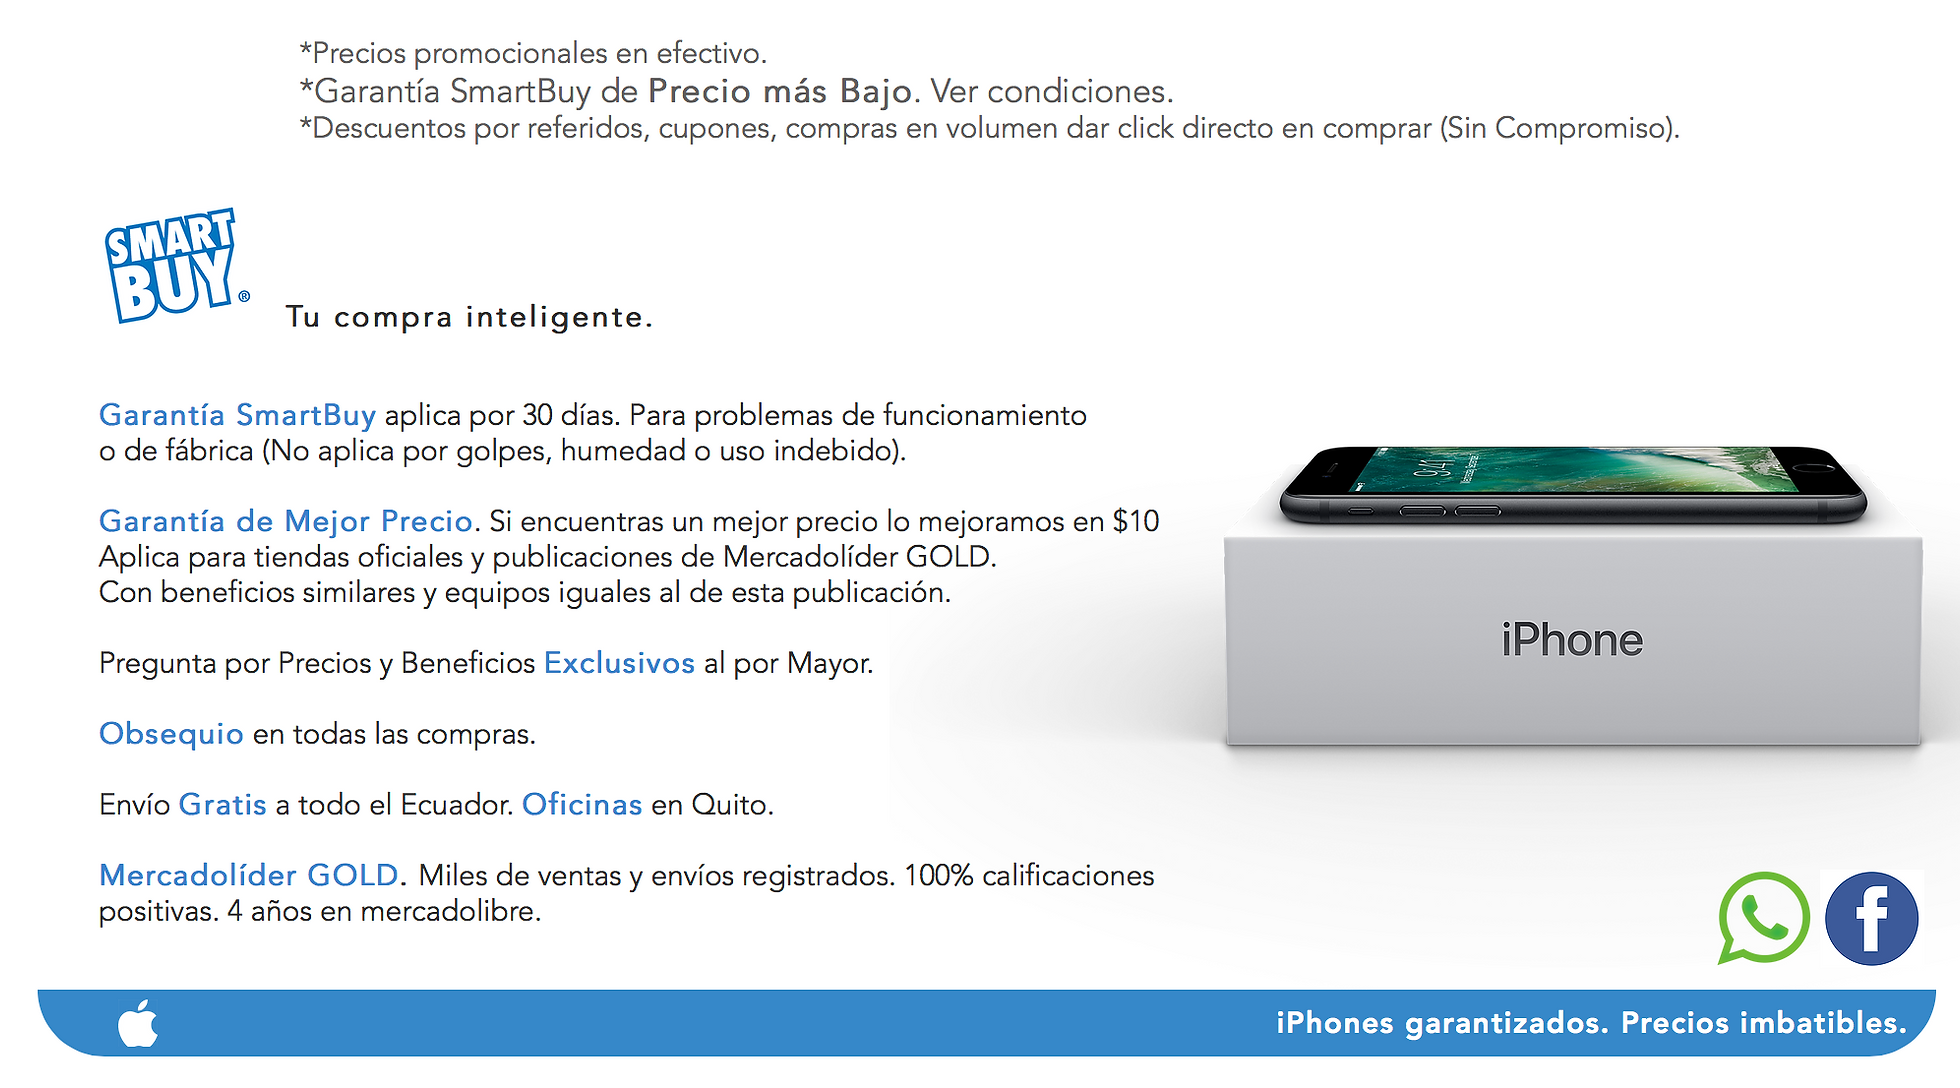 iphone Ecuador 099-370-5389